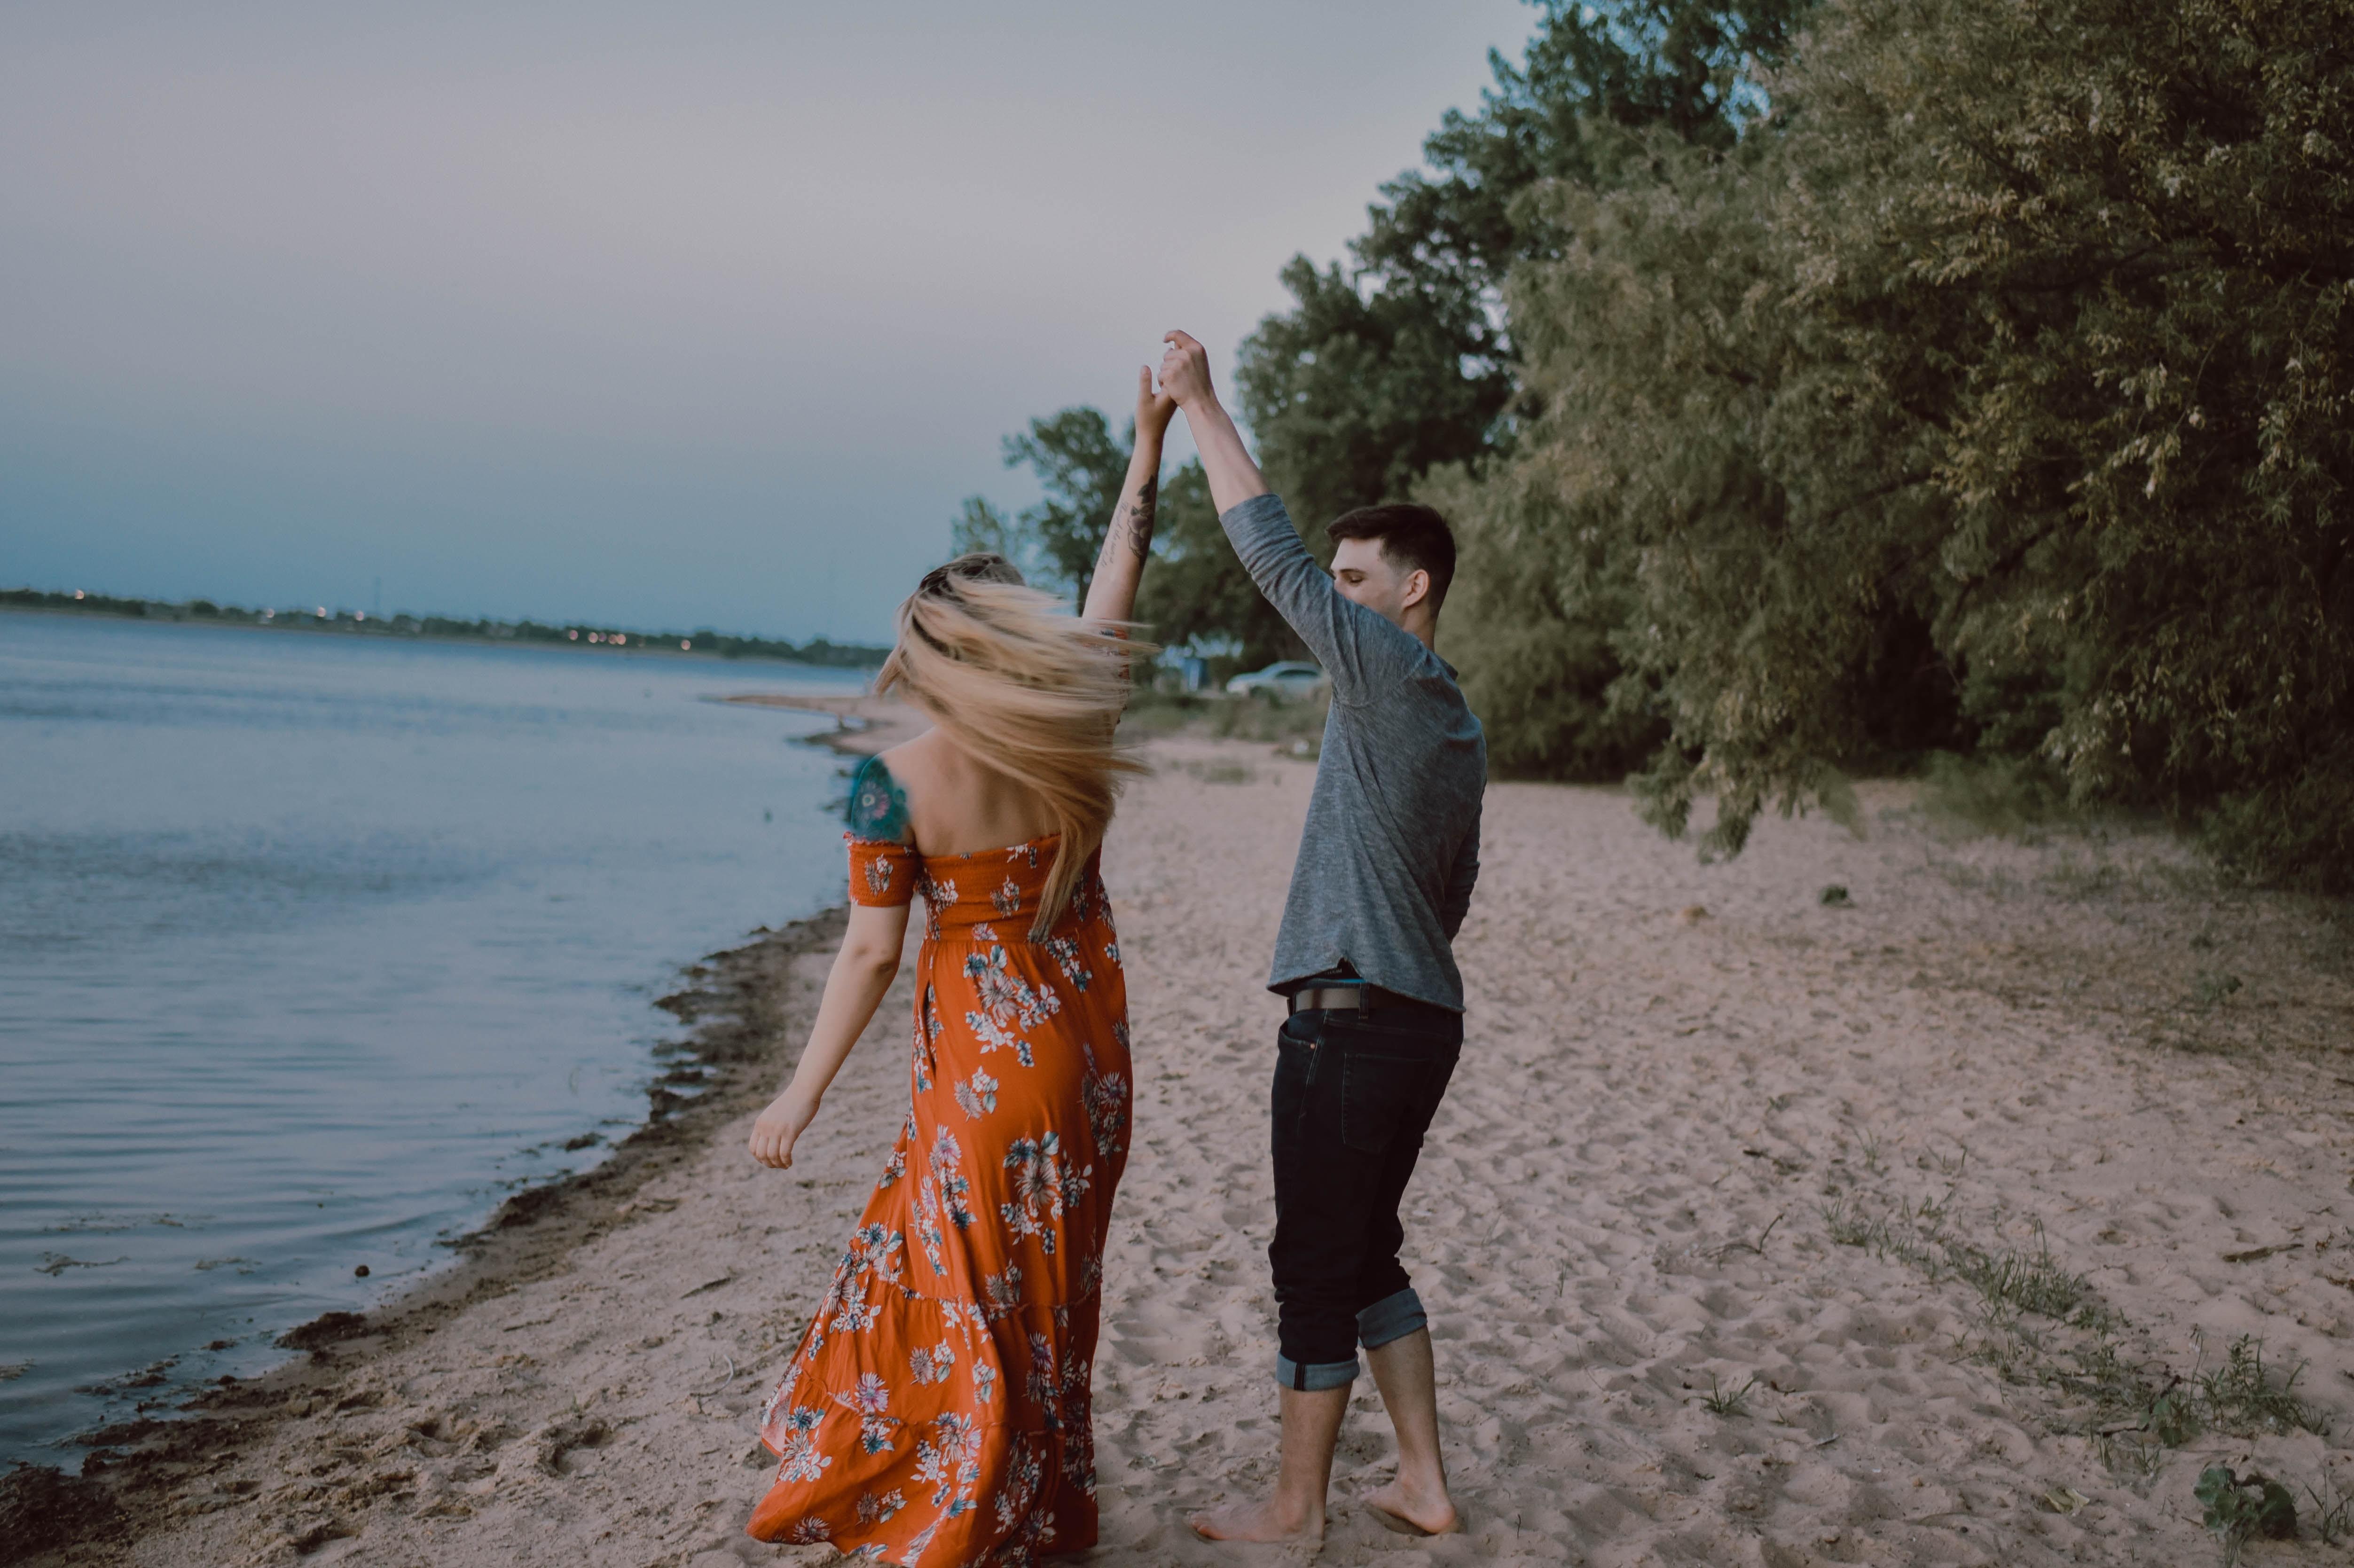 man and woman holding hands near seashore at daytime